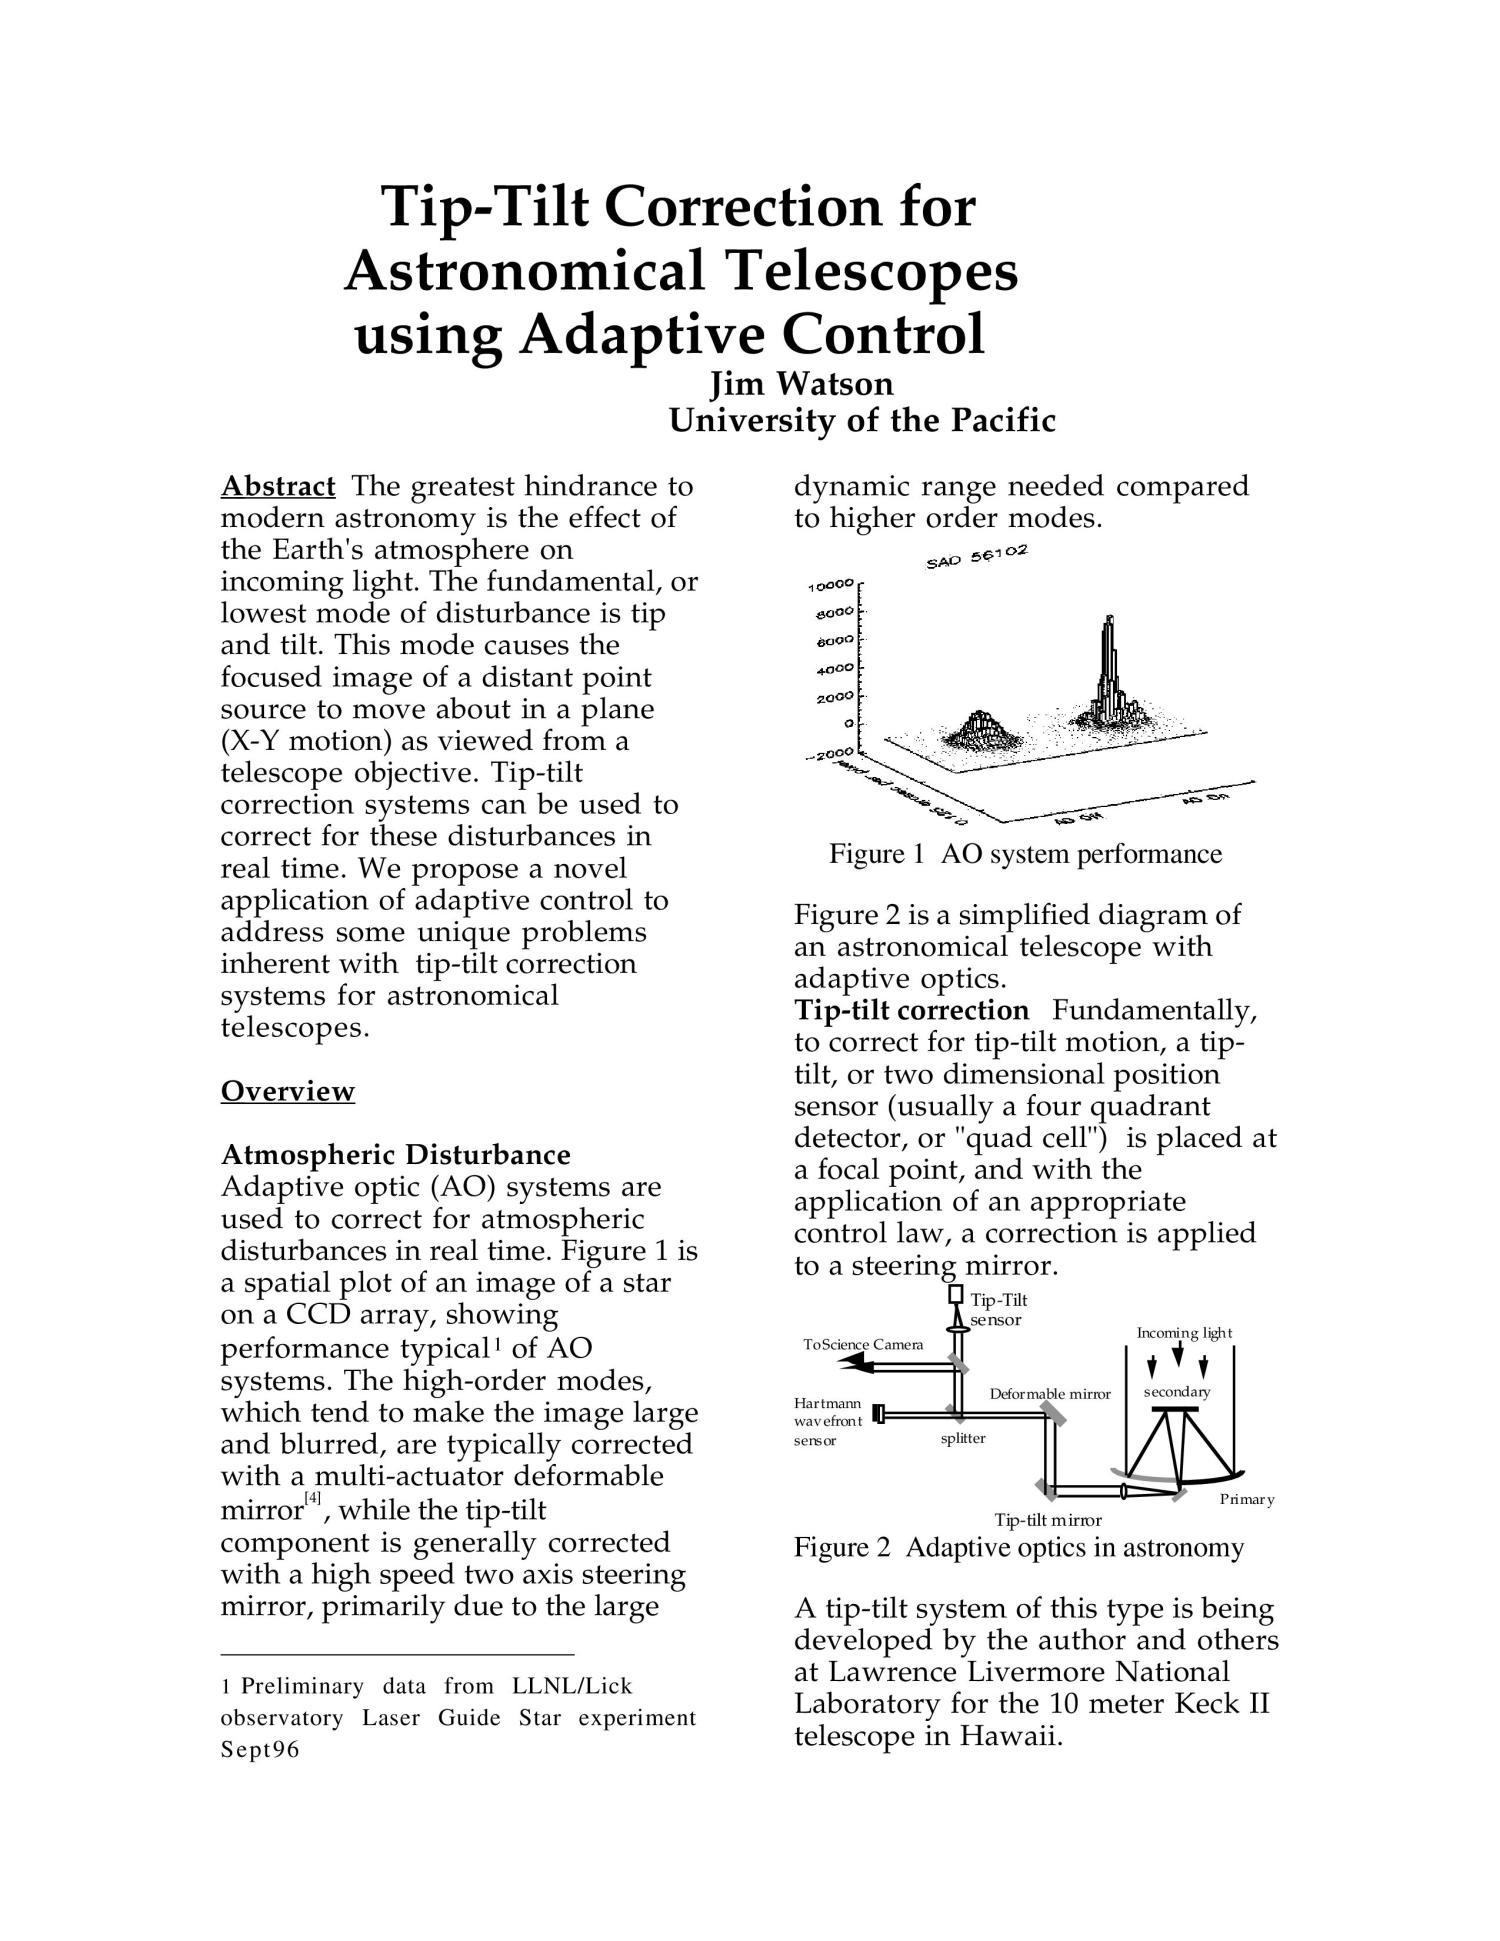 Tip tilt corection for astronomical telescopes using